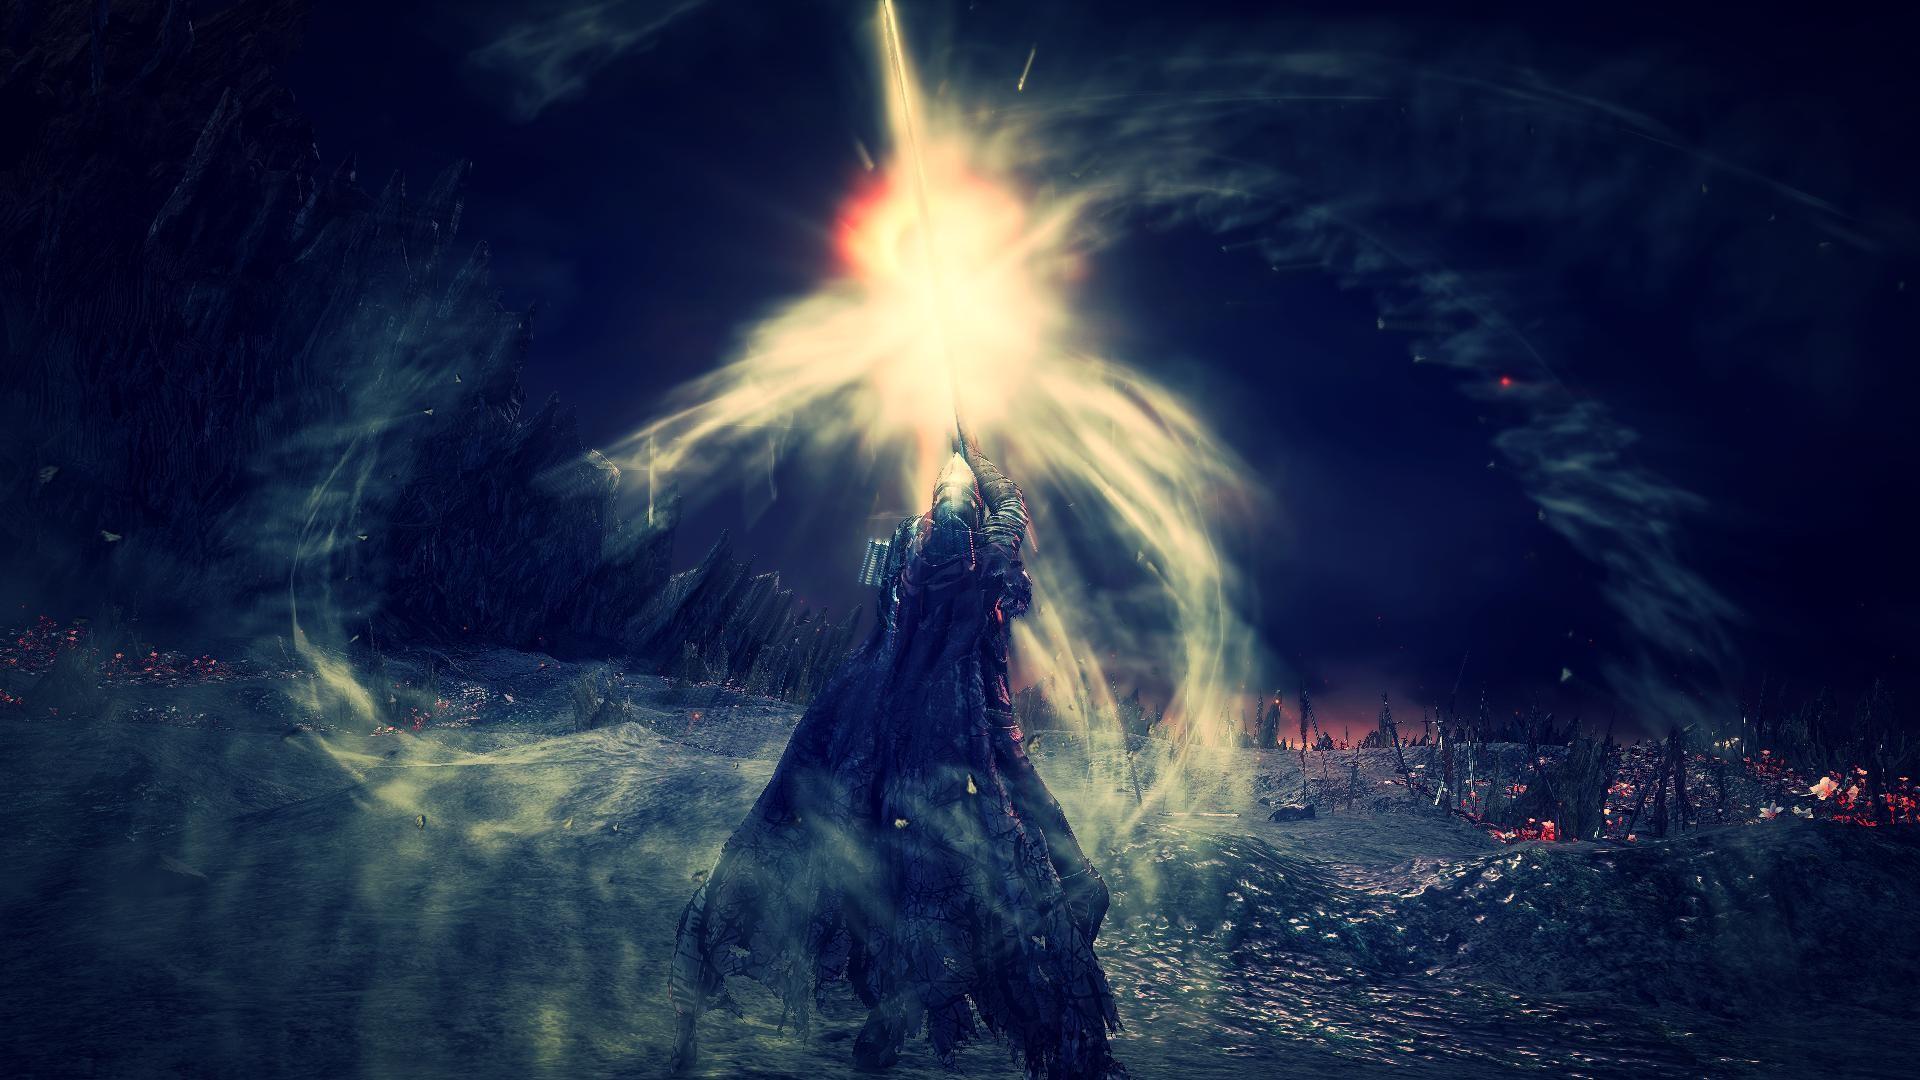 Dark Souls 3 wallpaper collection